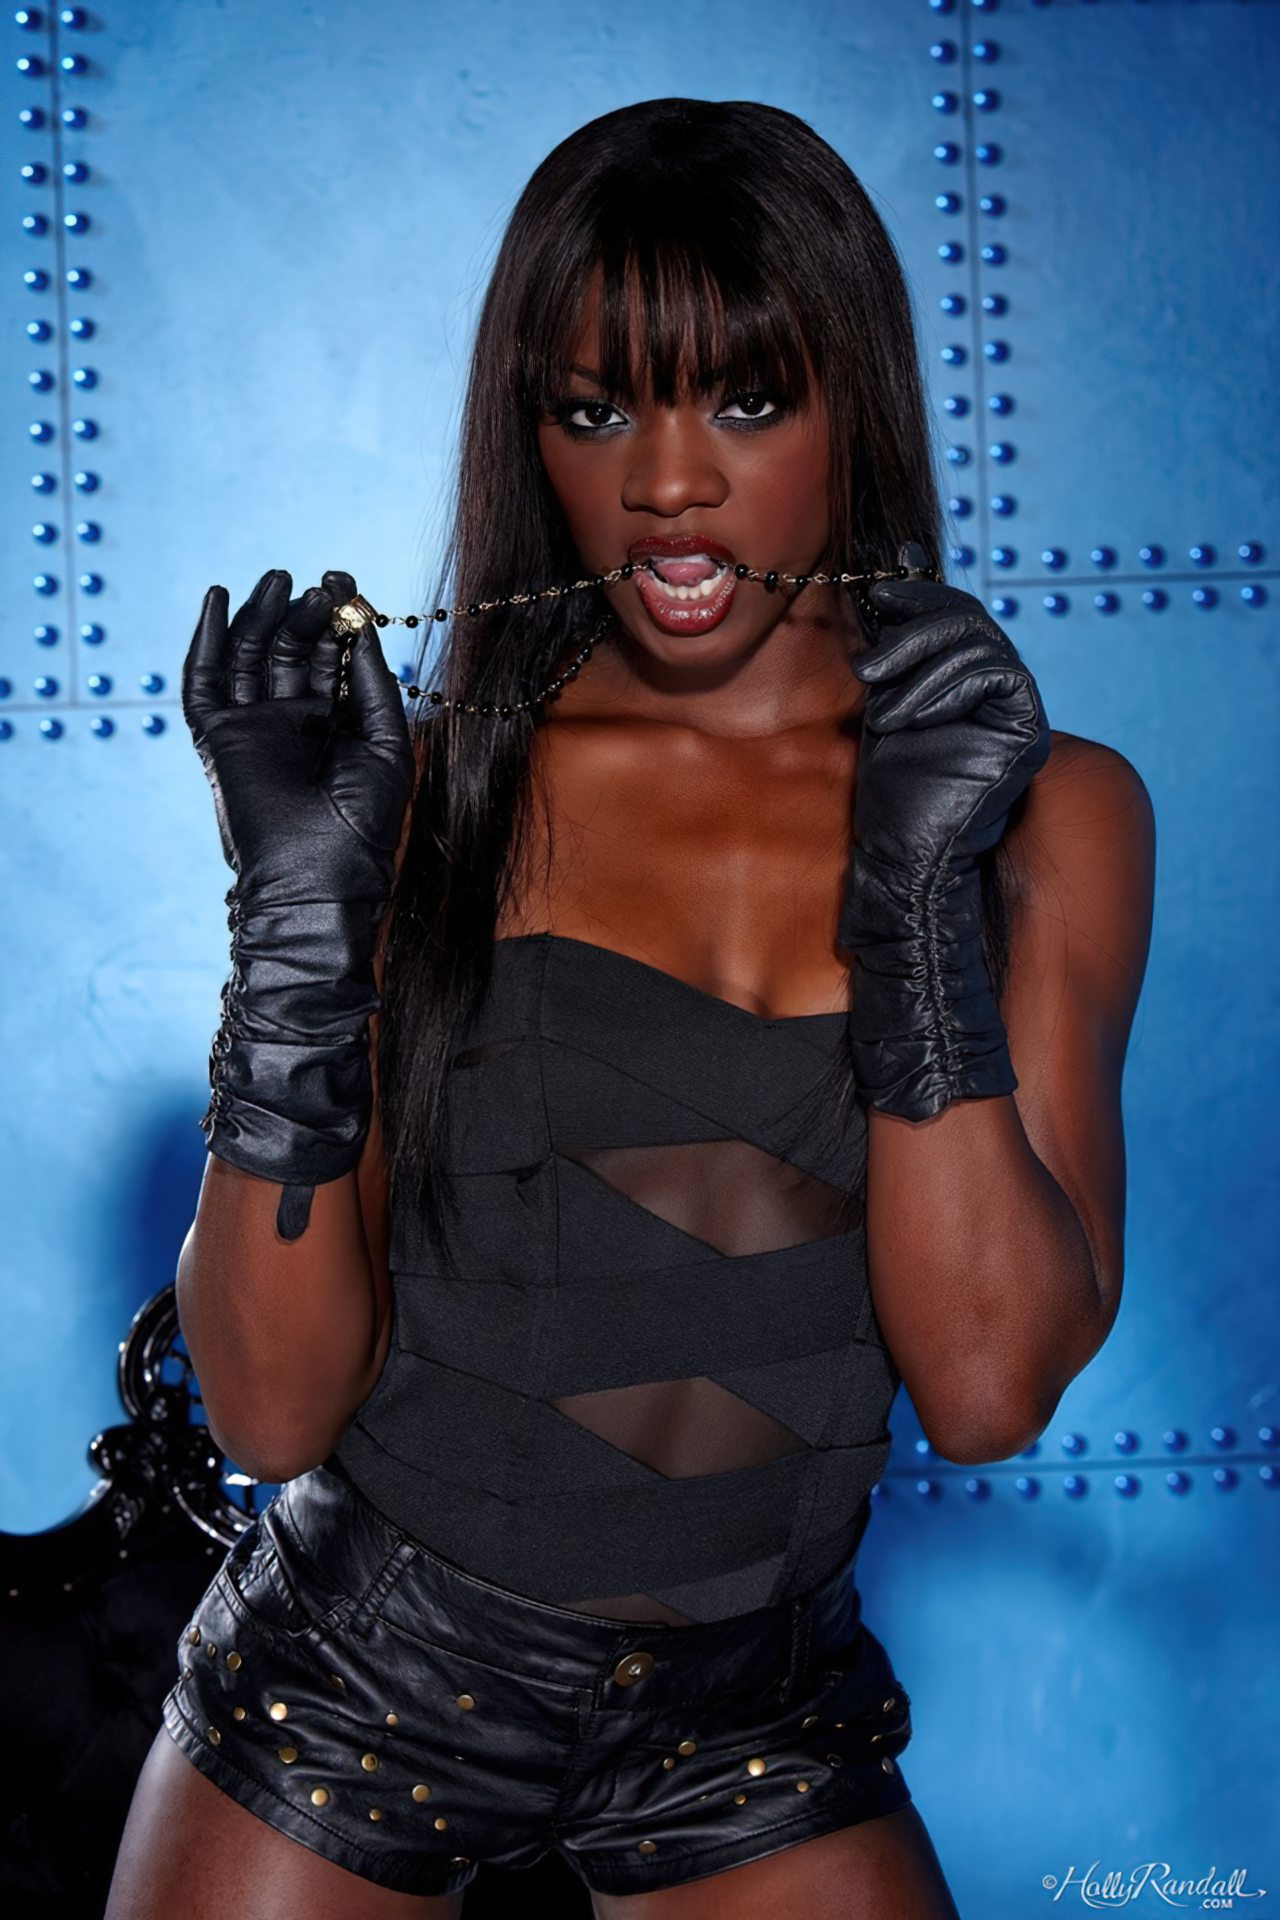 Ana Foxx Lingerie Negra (2)